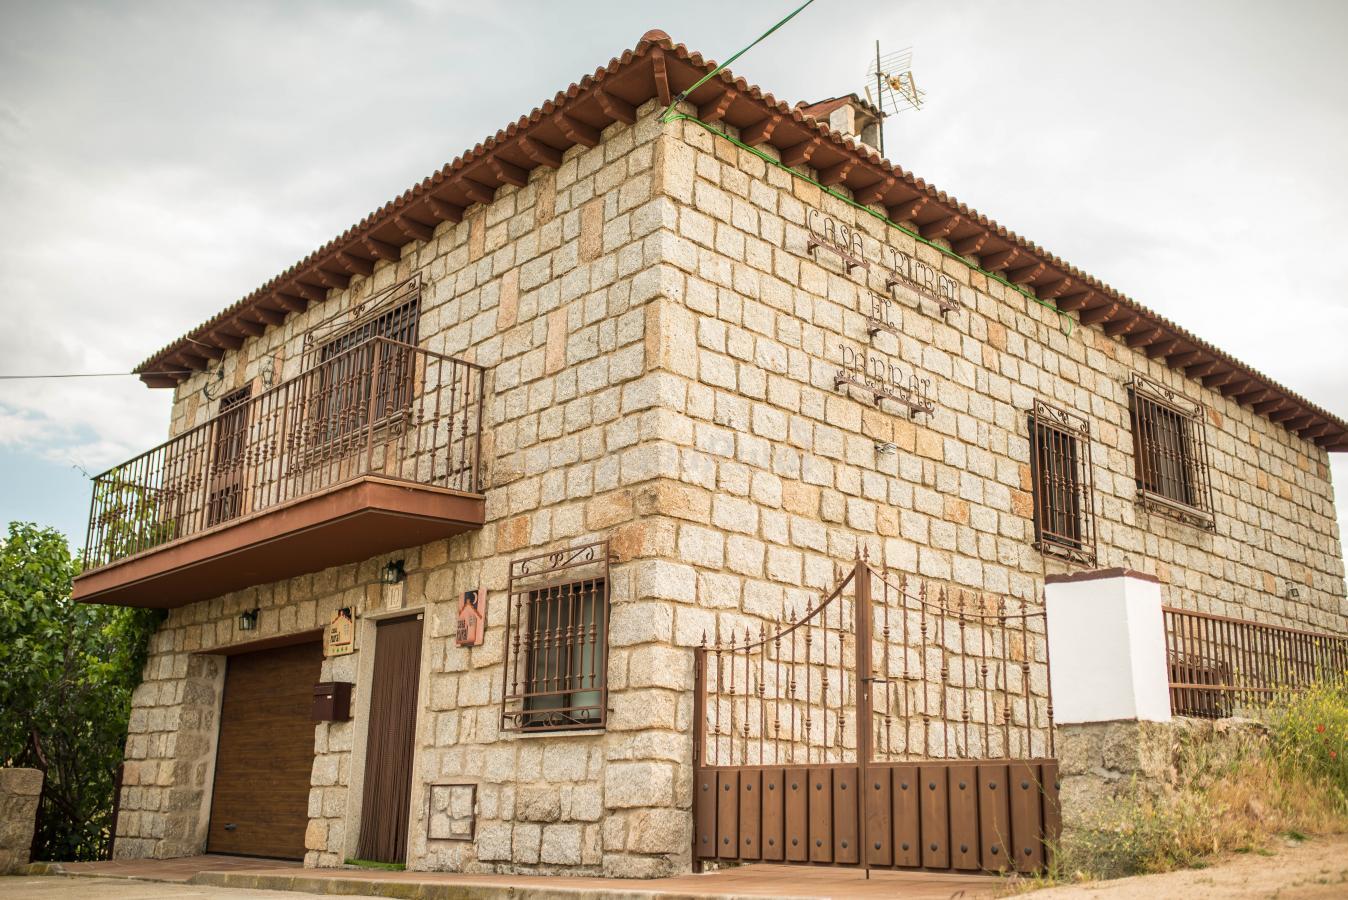 Fotos de el parral casa rural en burgohondo vila - Casa rural el parral ...